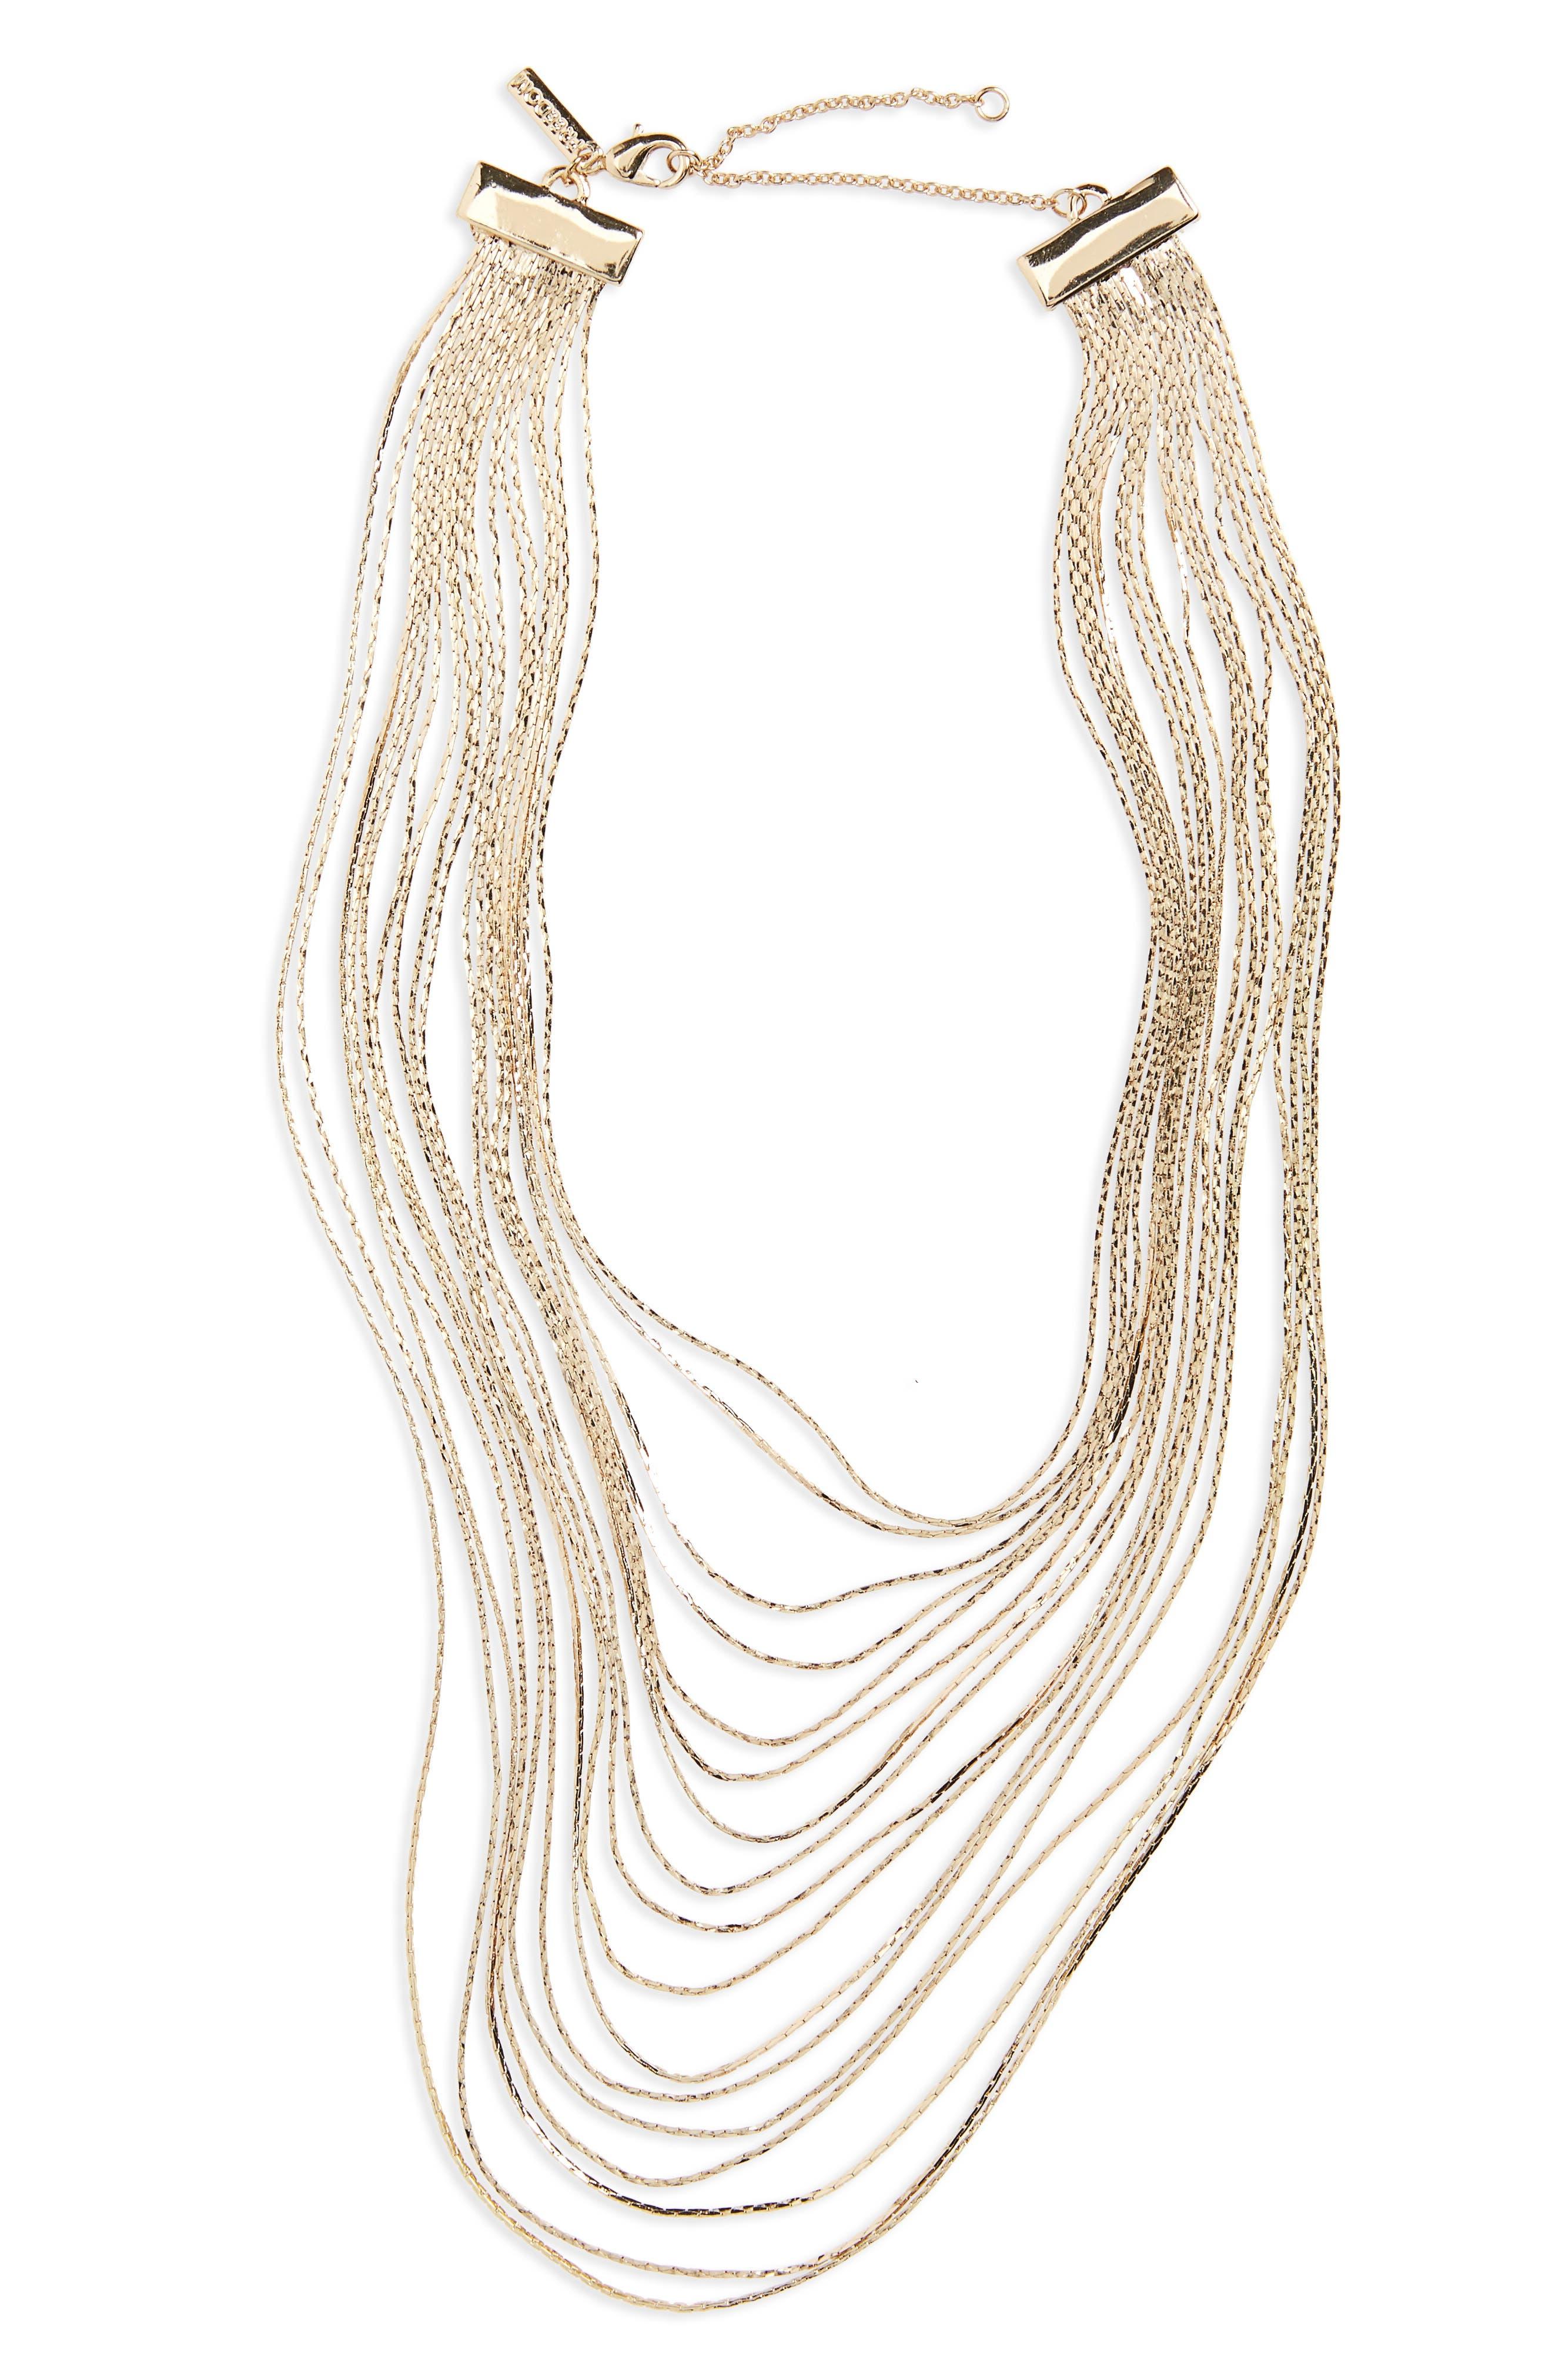 Topshop Multistrand Necklace